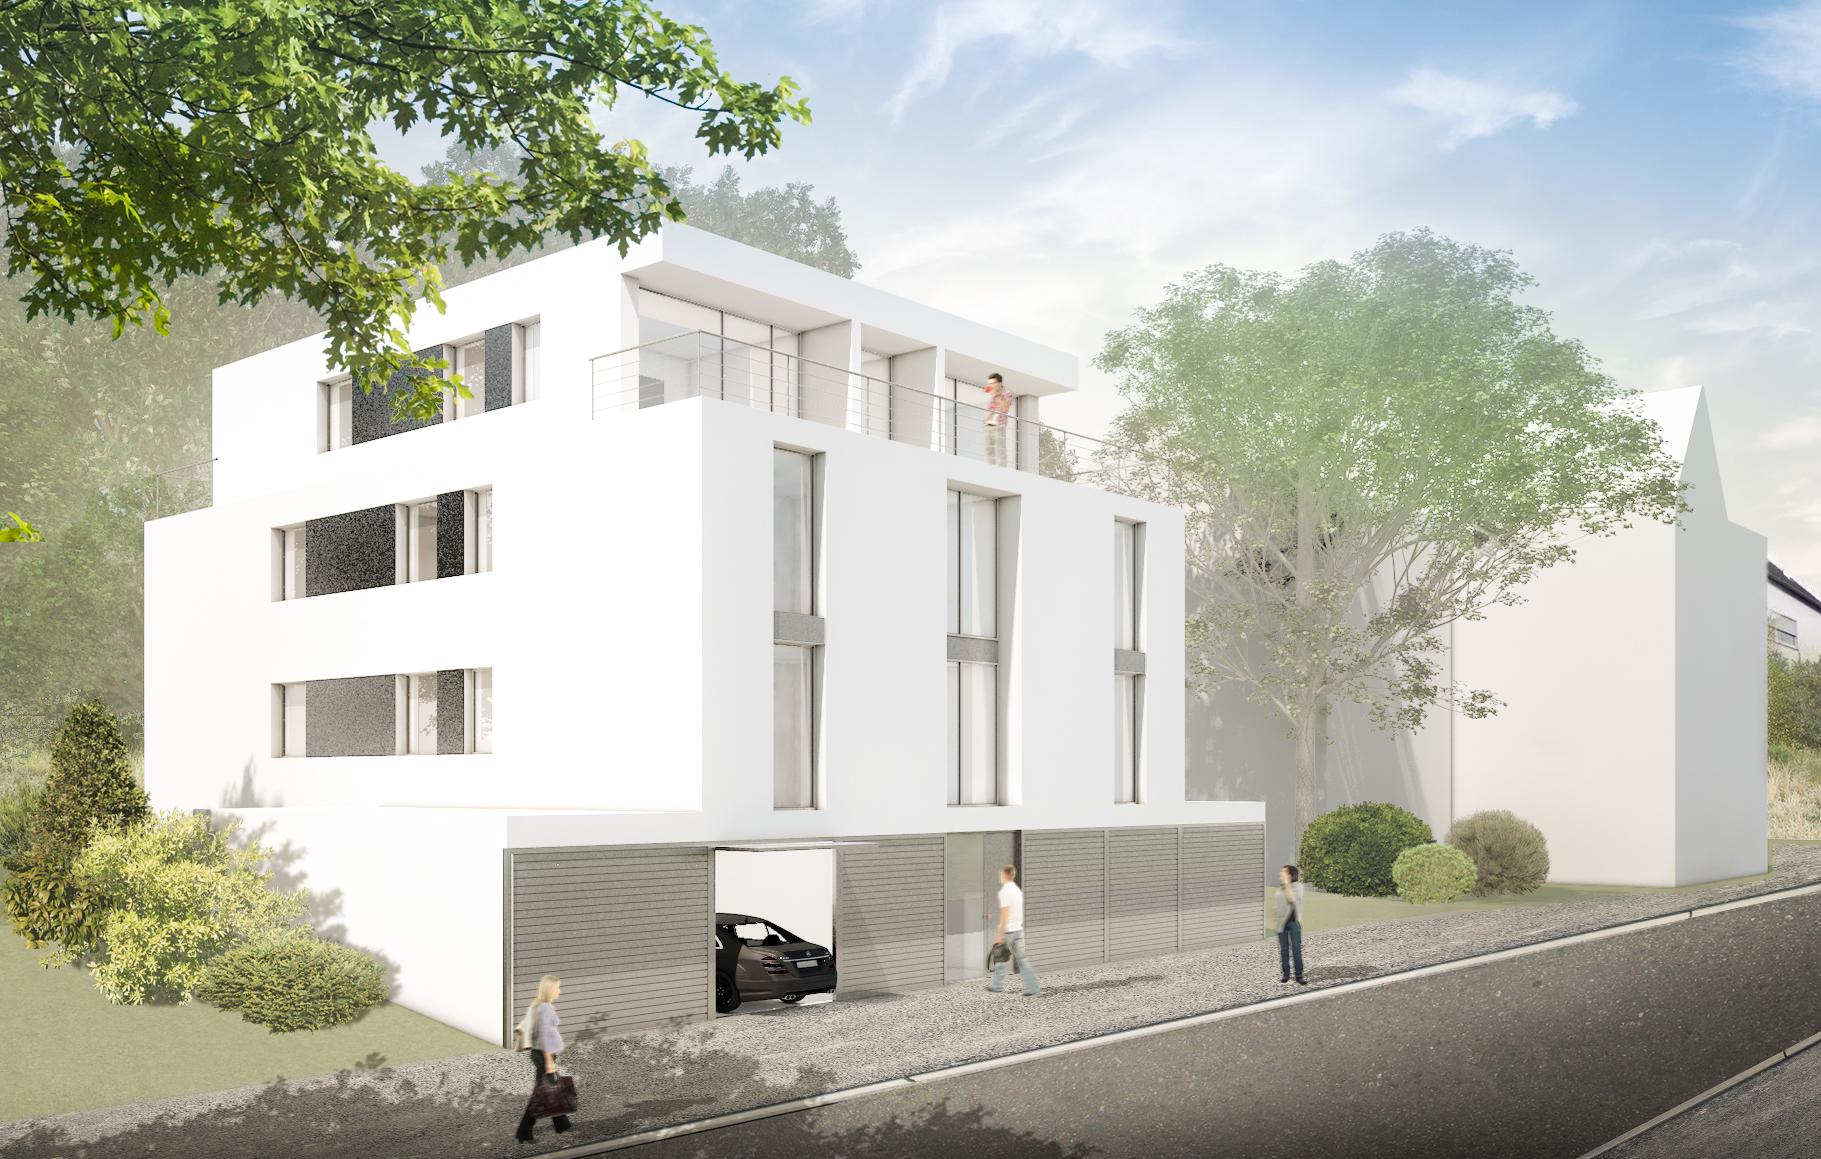 Mehrfamilienhaus, Dortmund - Rendering Solutions